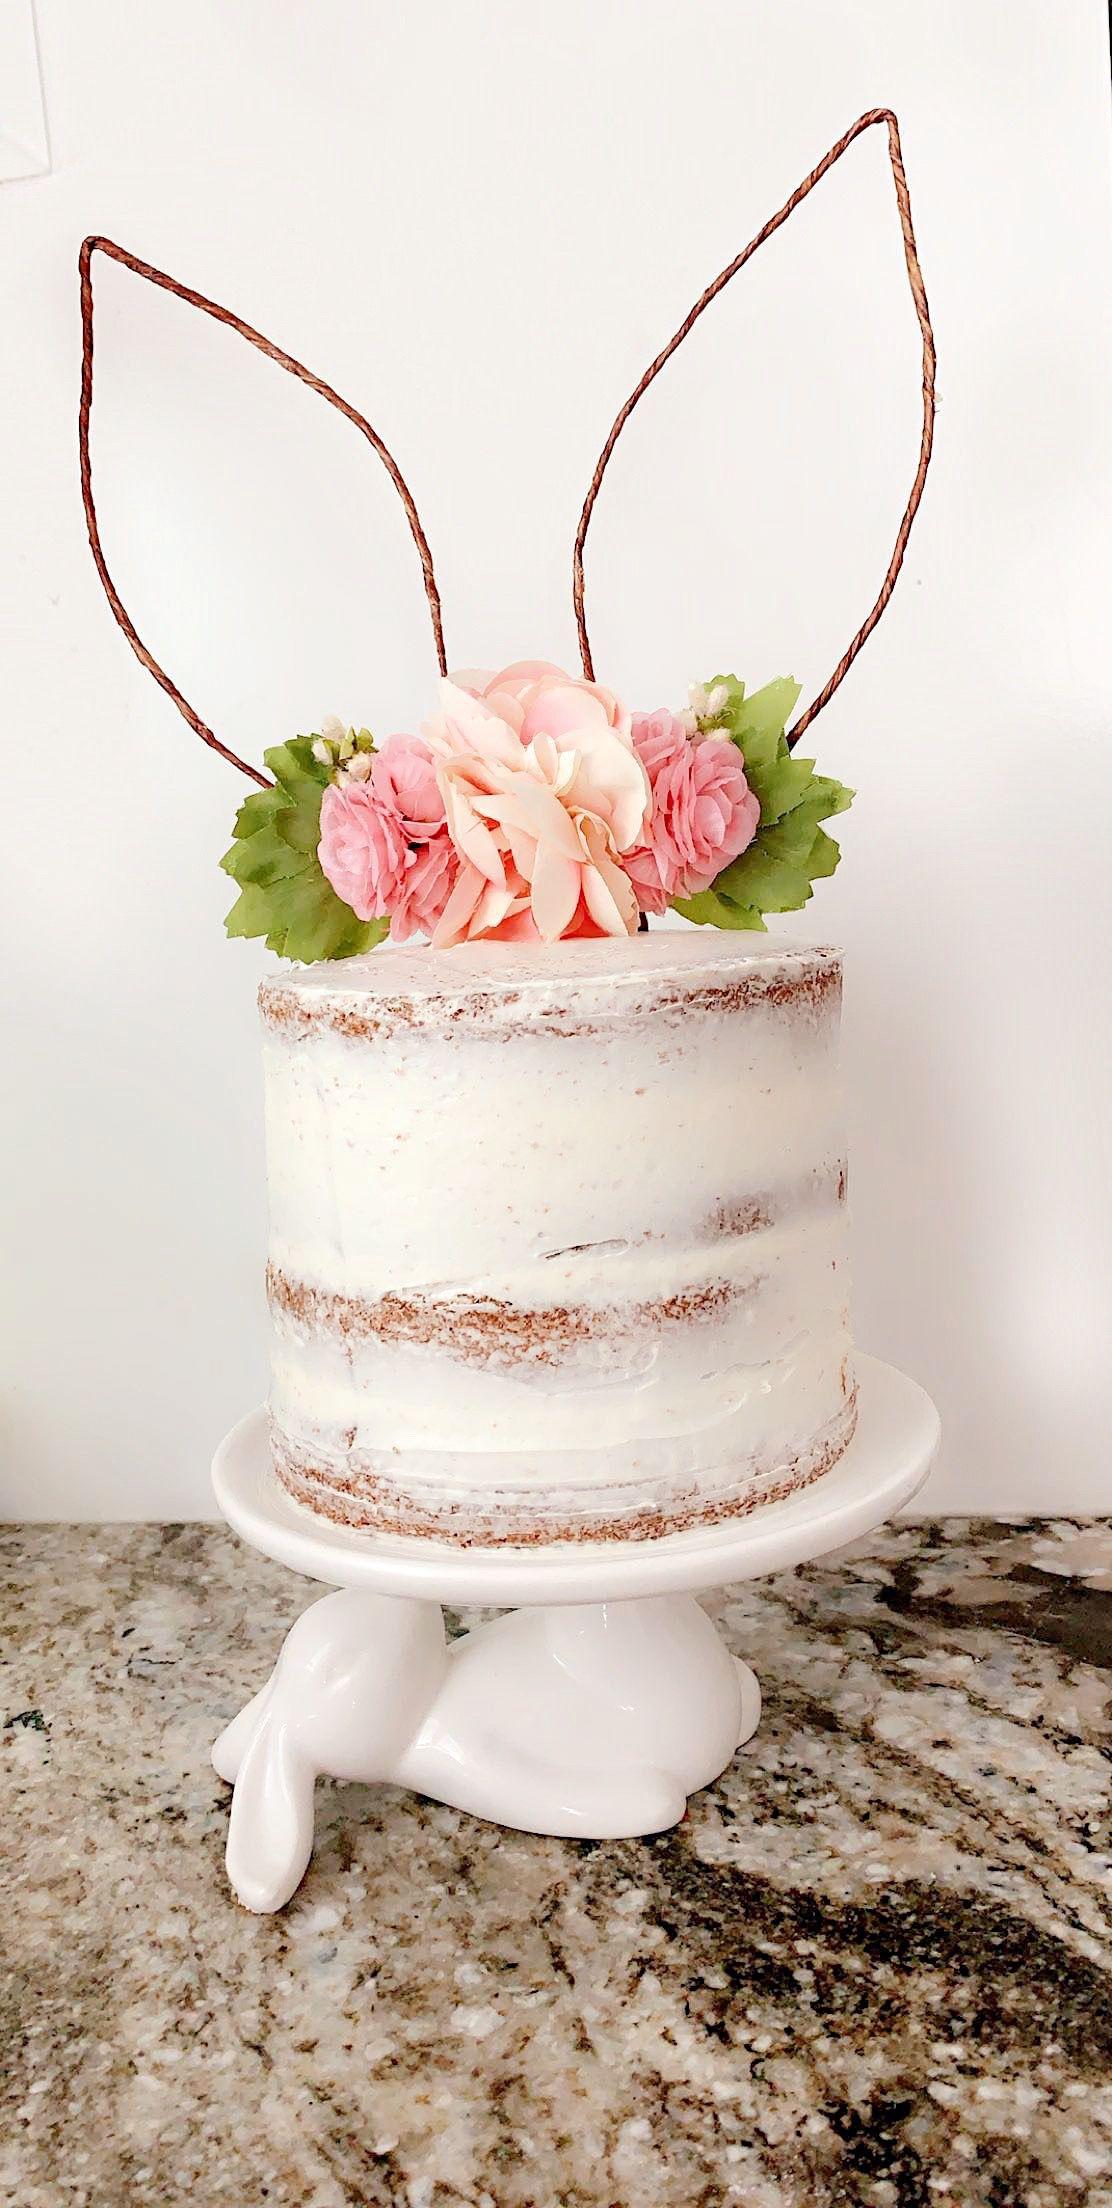 Bunny Cake #firstbirthdaygirl